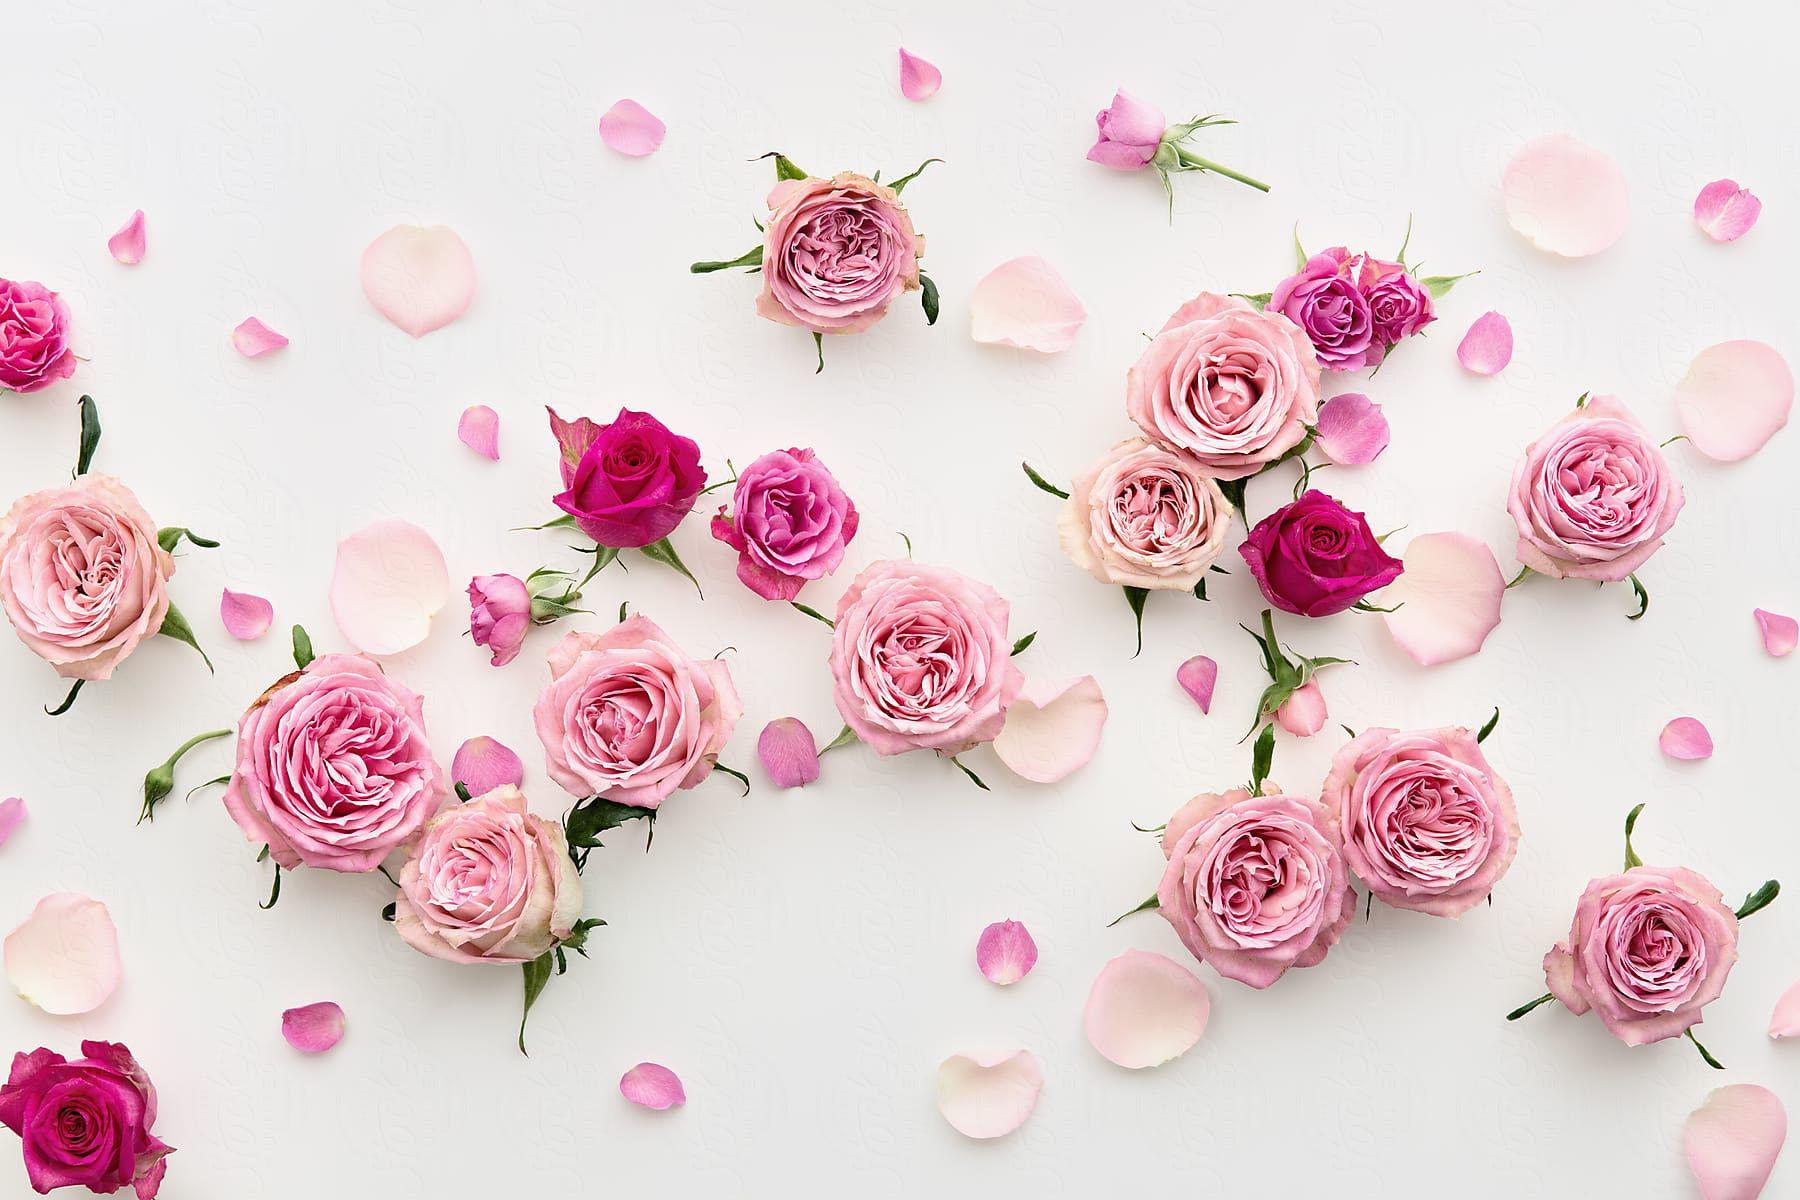 Background bông hoa hồng